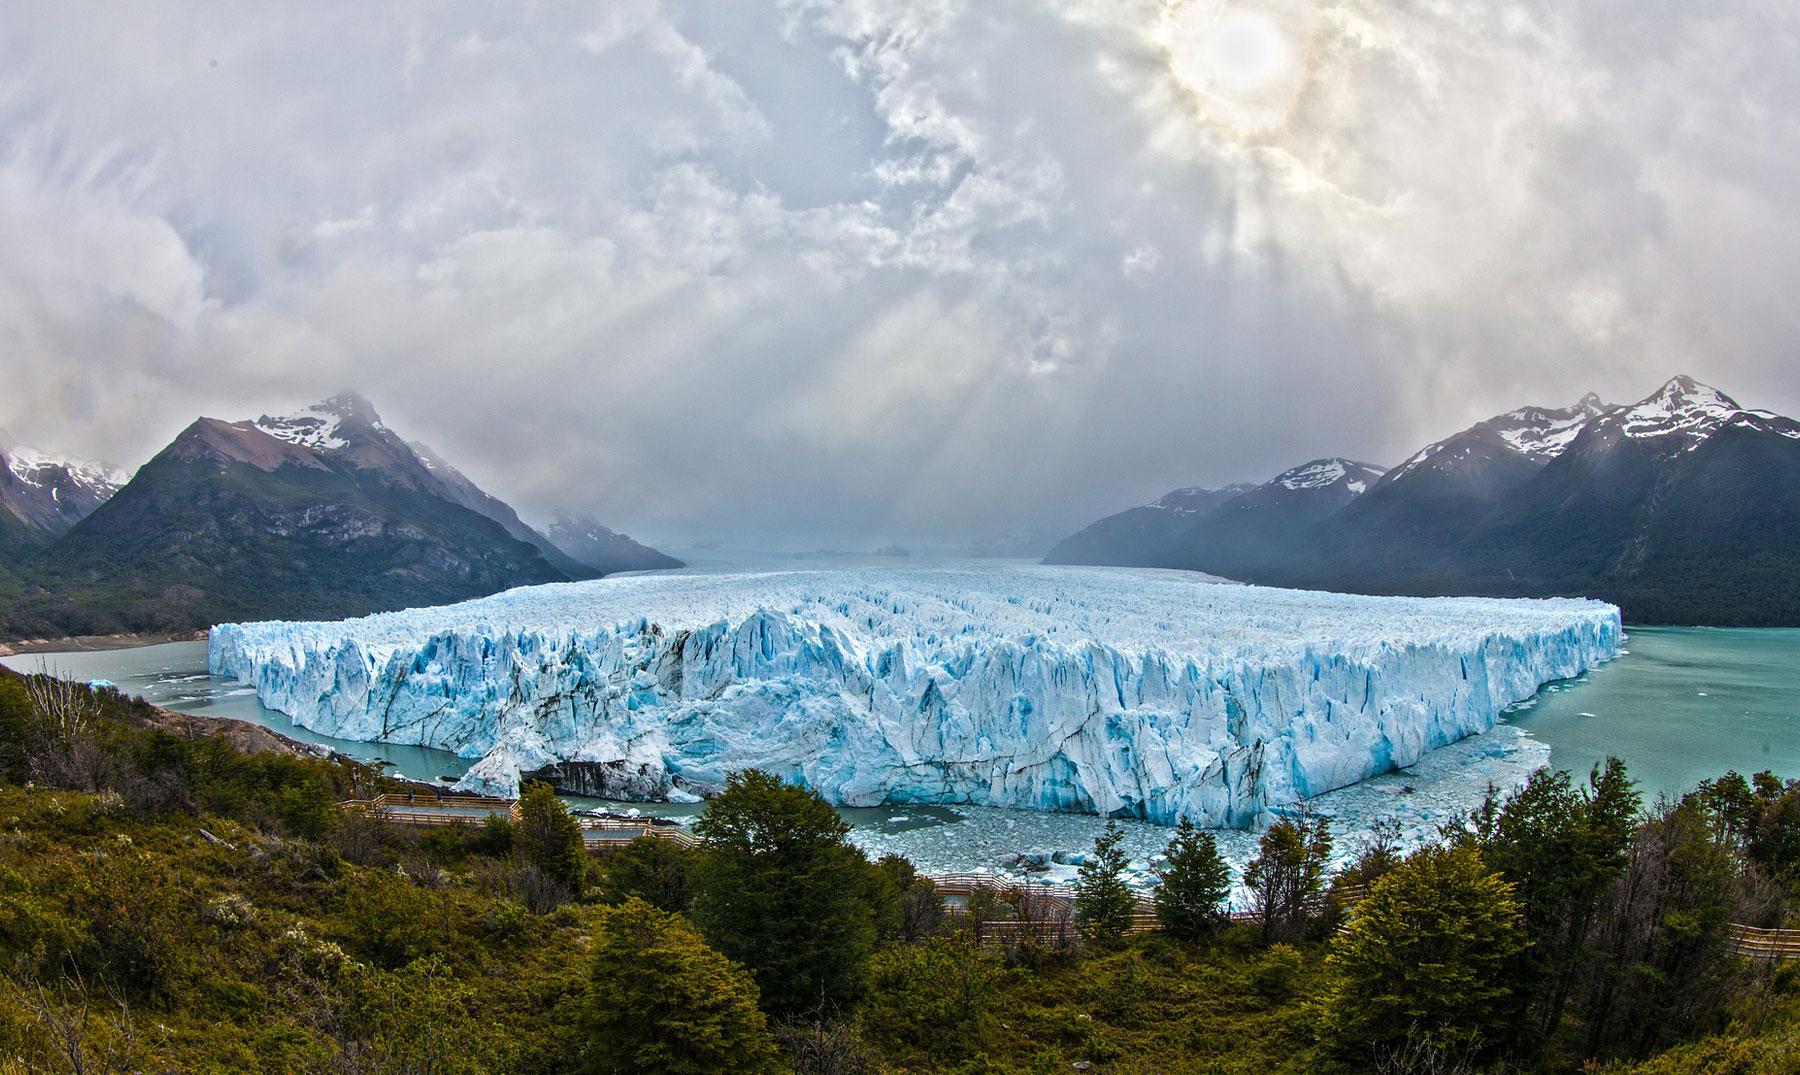 Argentina, un país de bellezas heladas